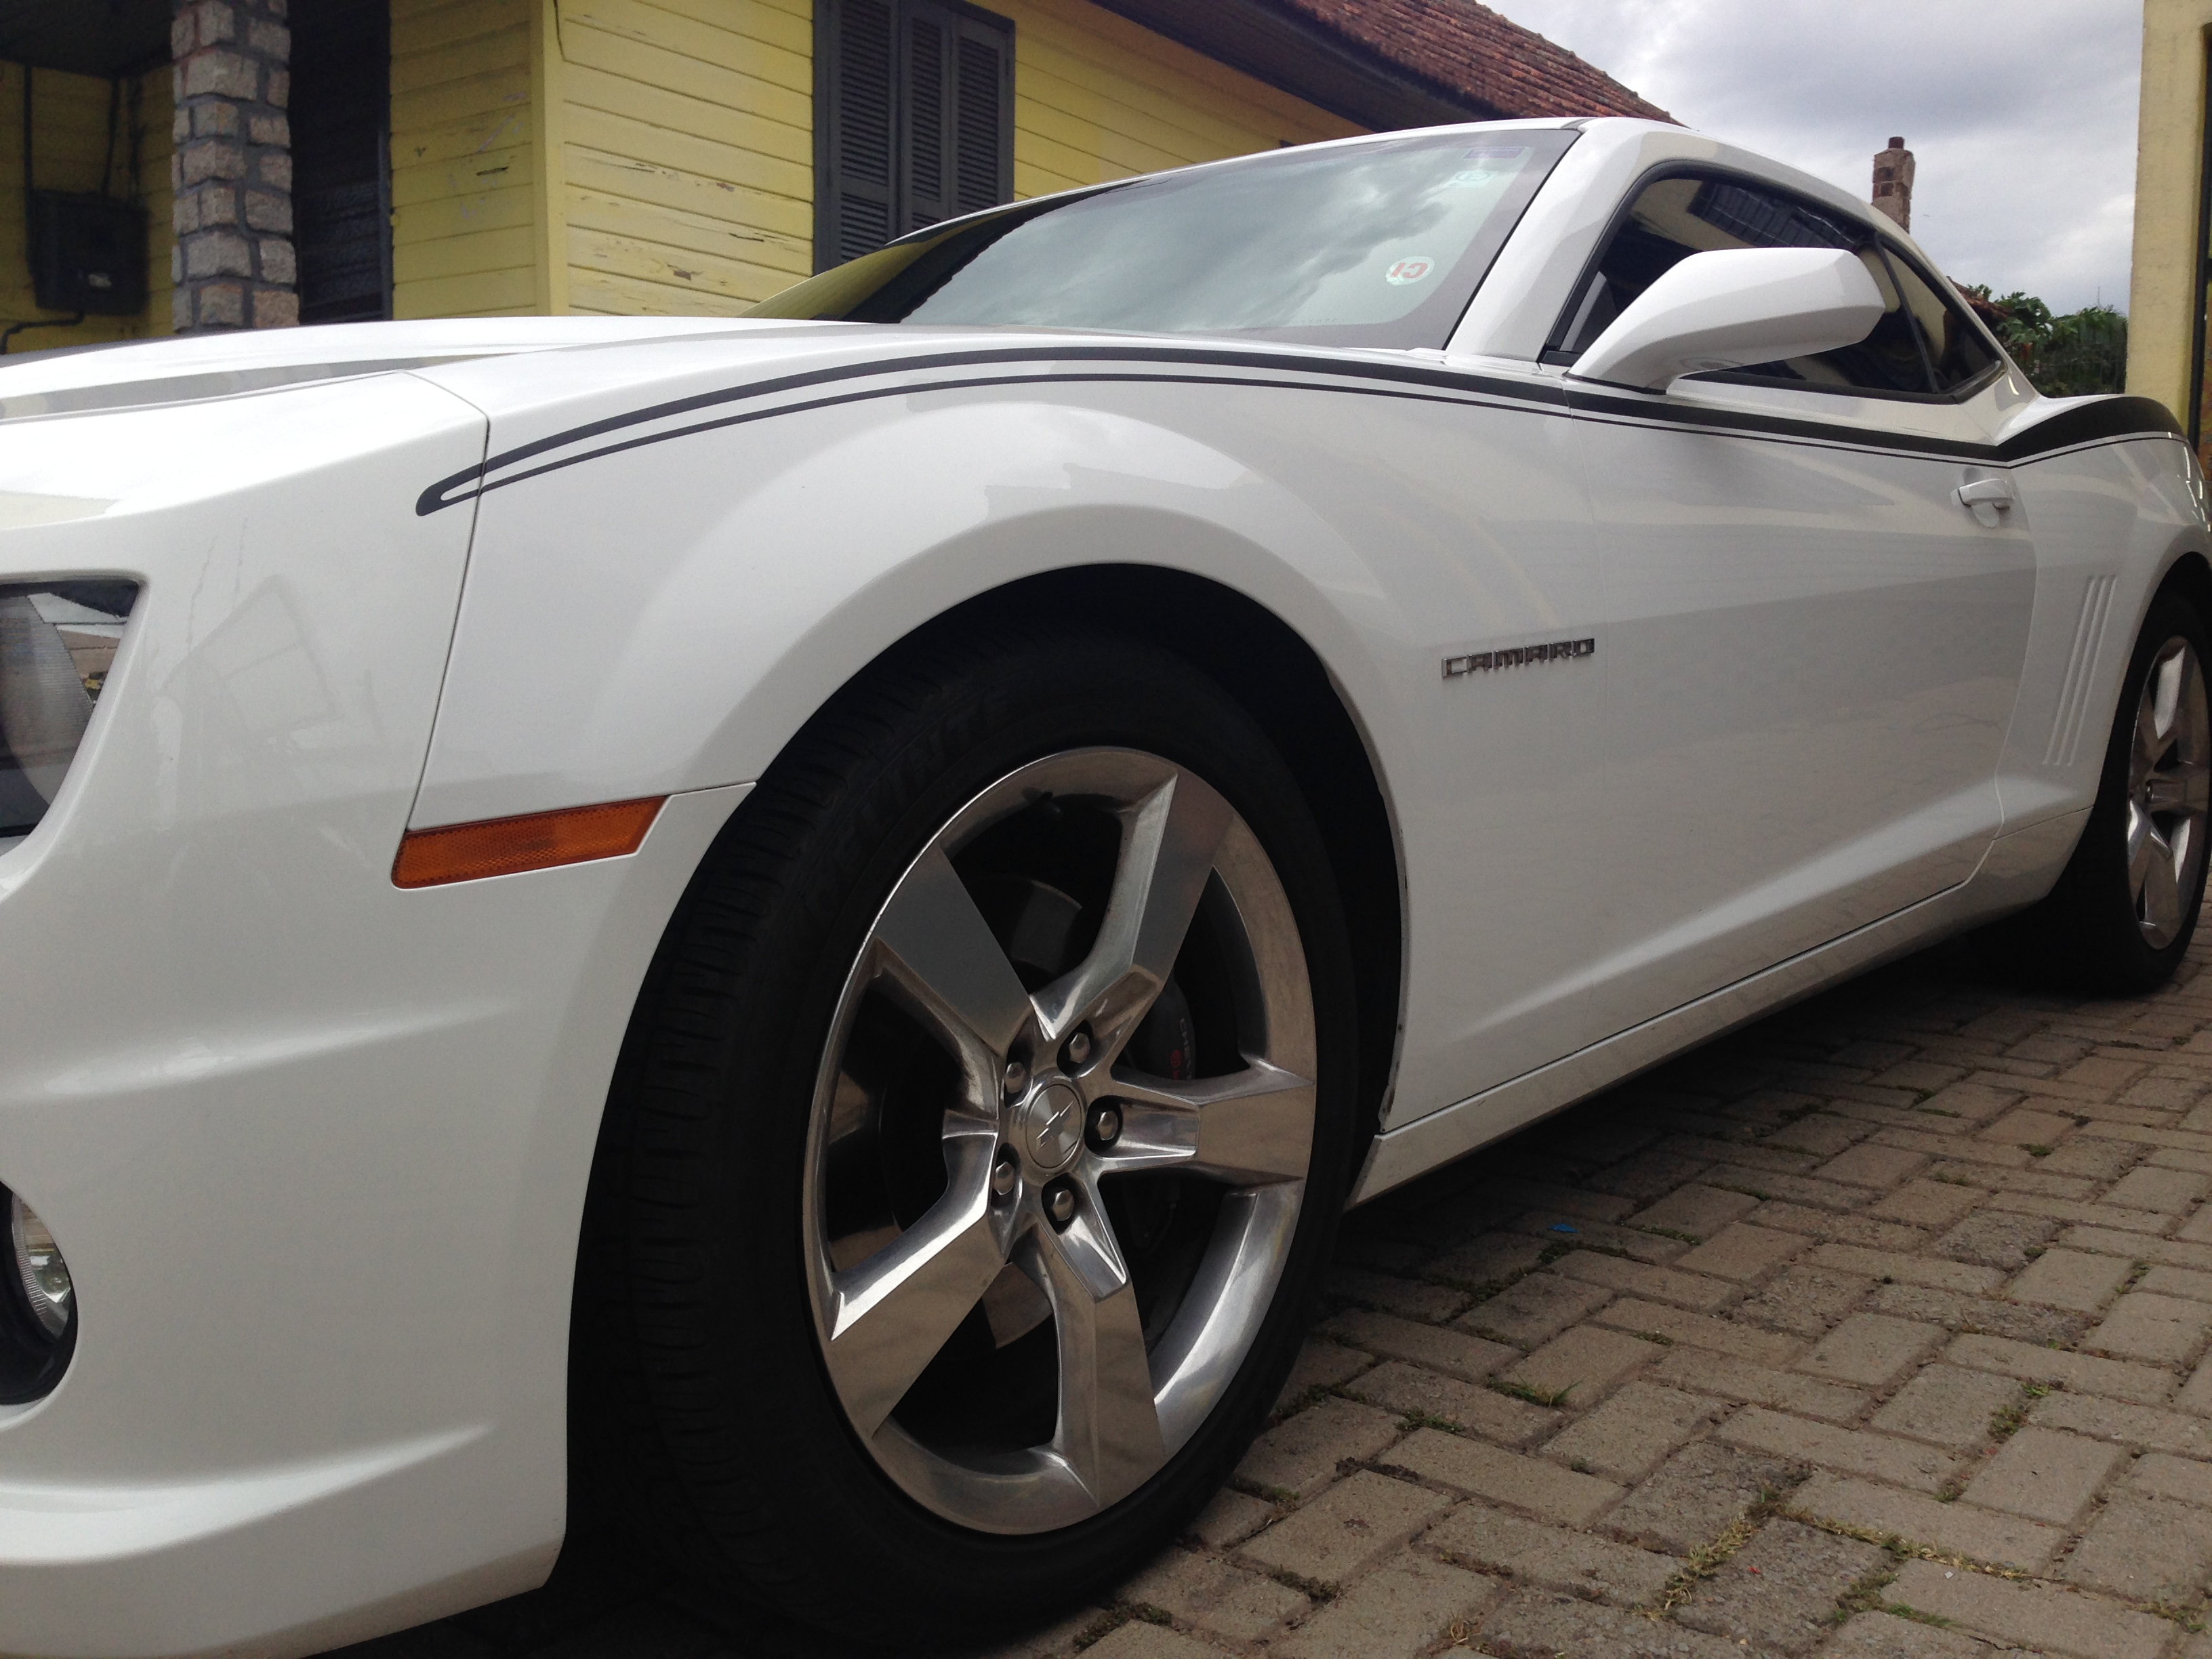 Camaro branco